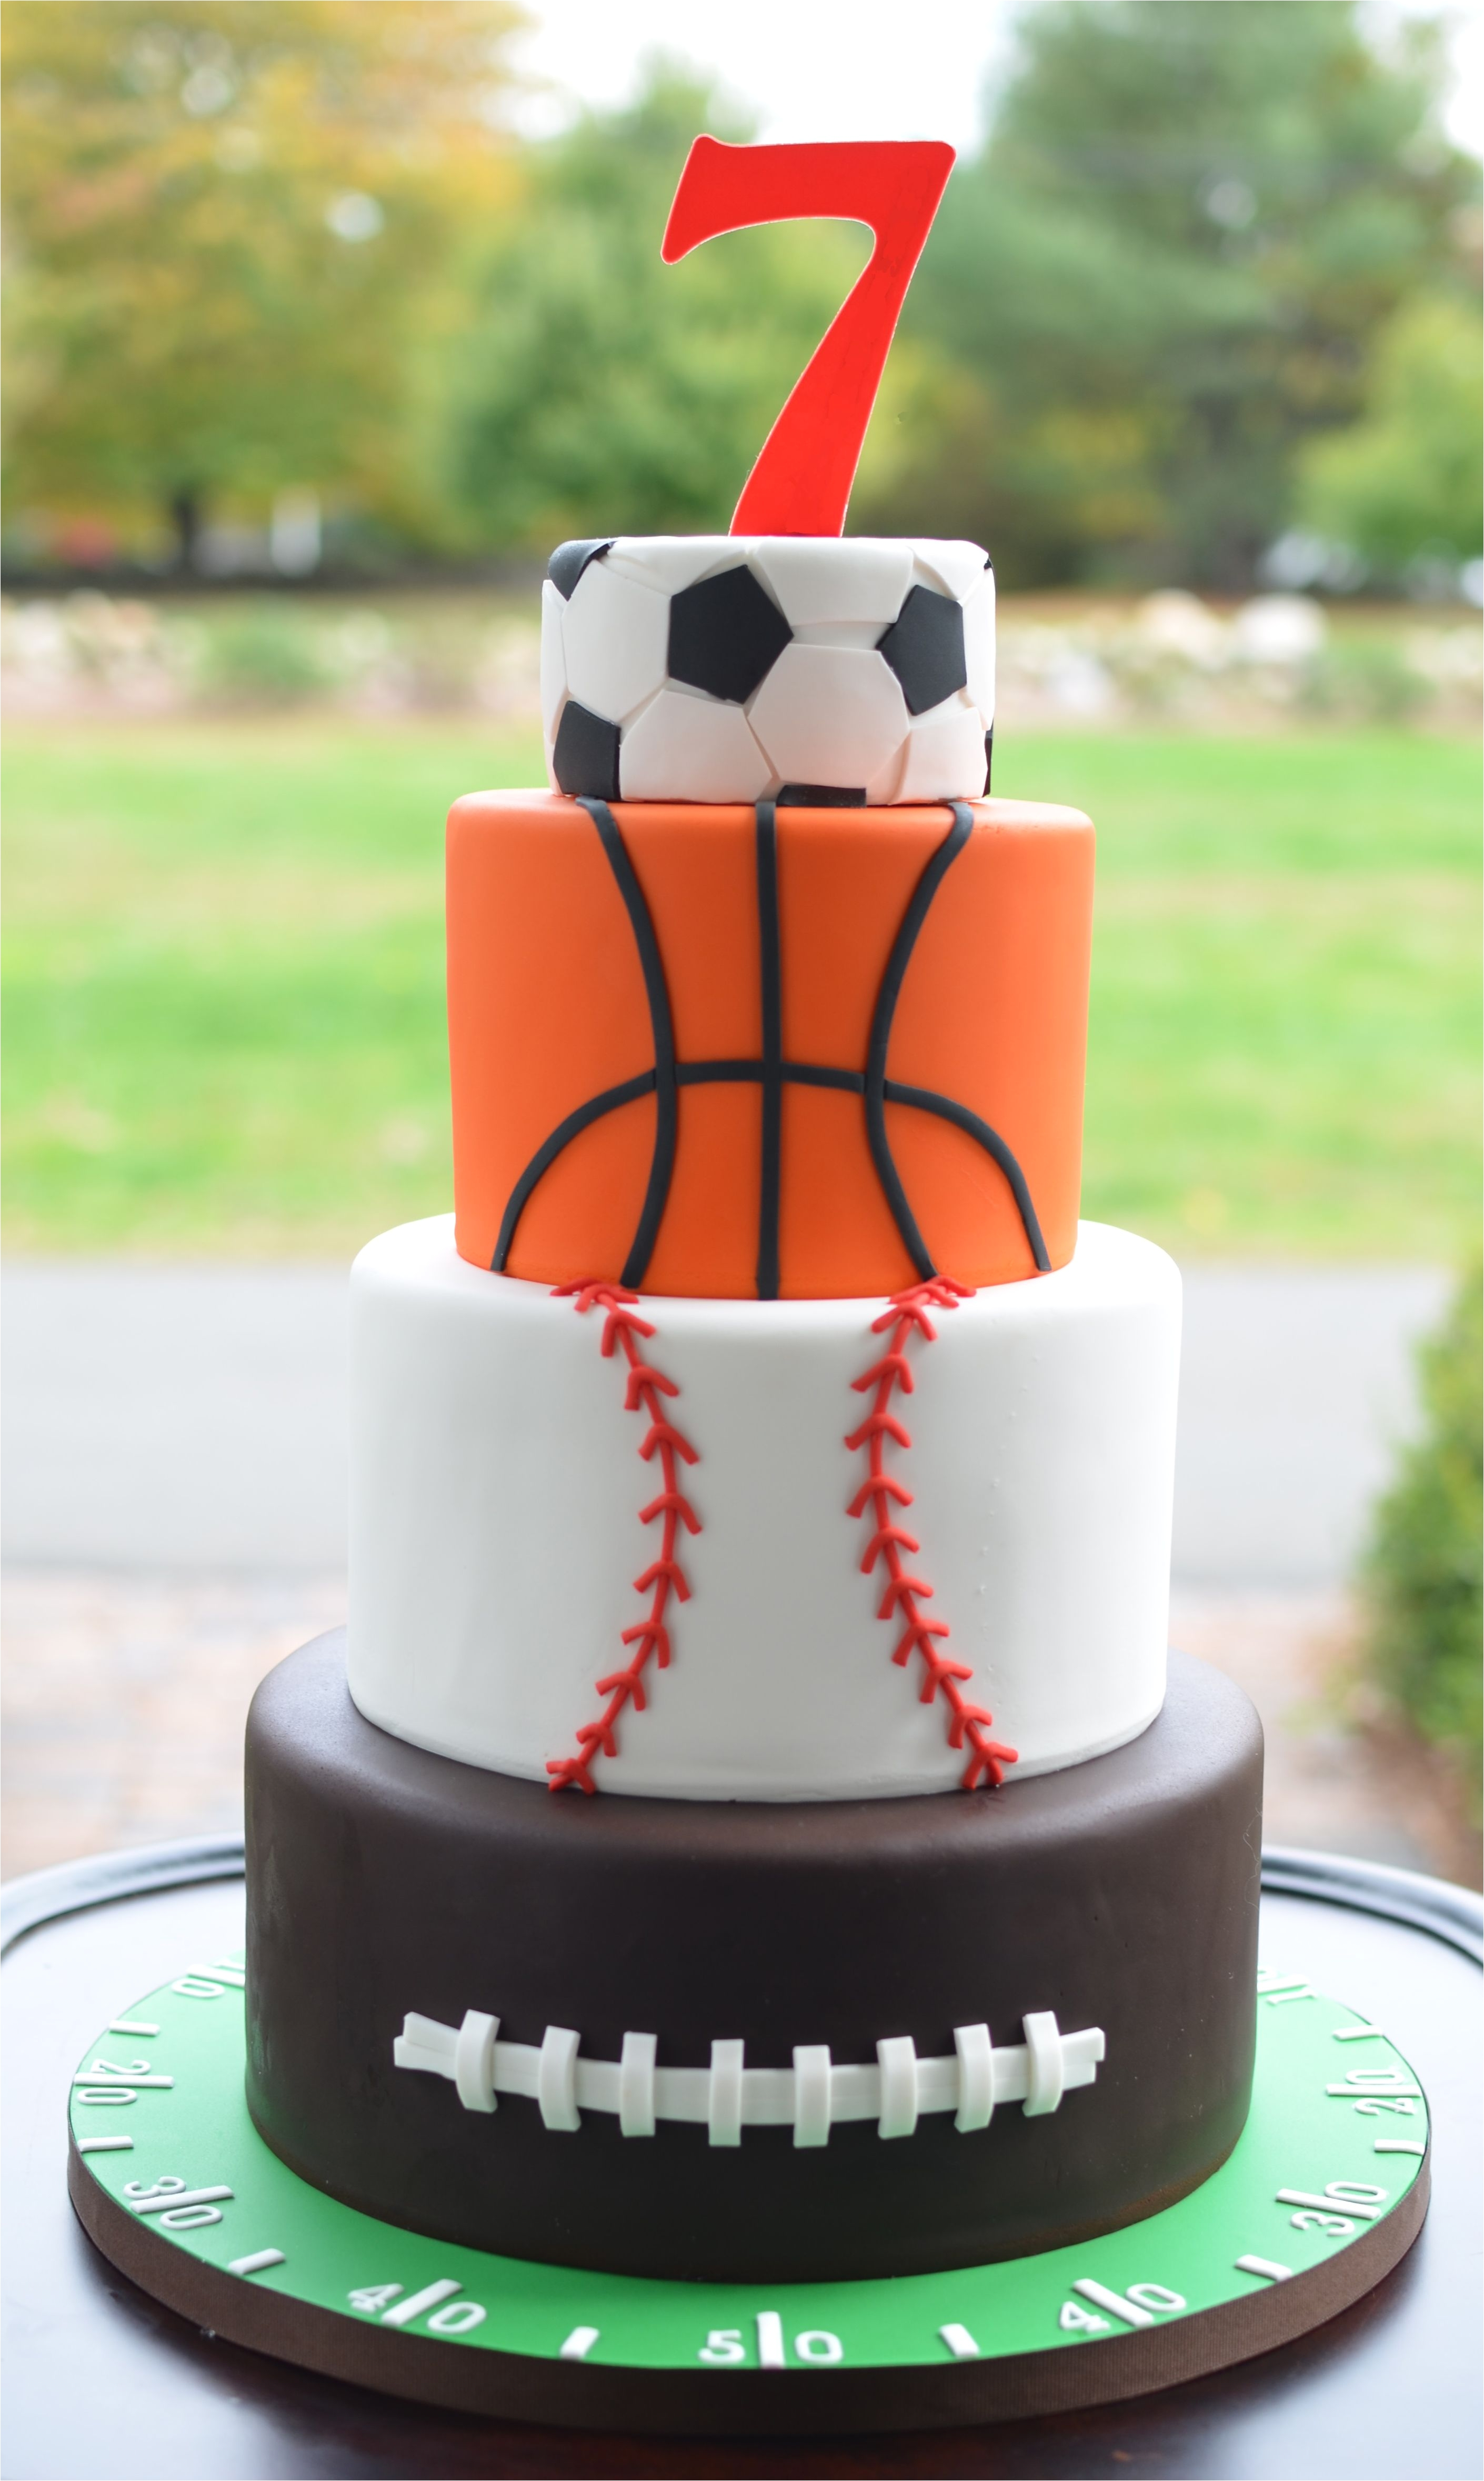 Baseball Player Cake Decorations All Star Sports themed Birthday Cake but A Dream Custom Cakes